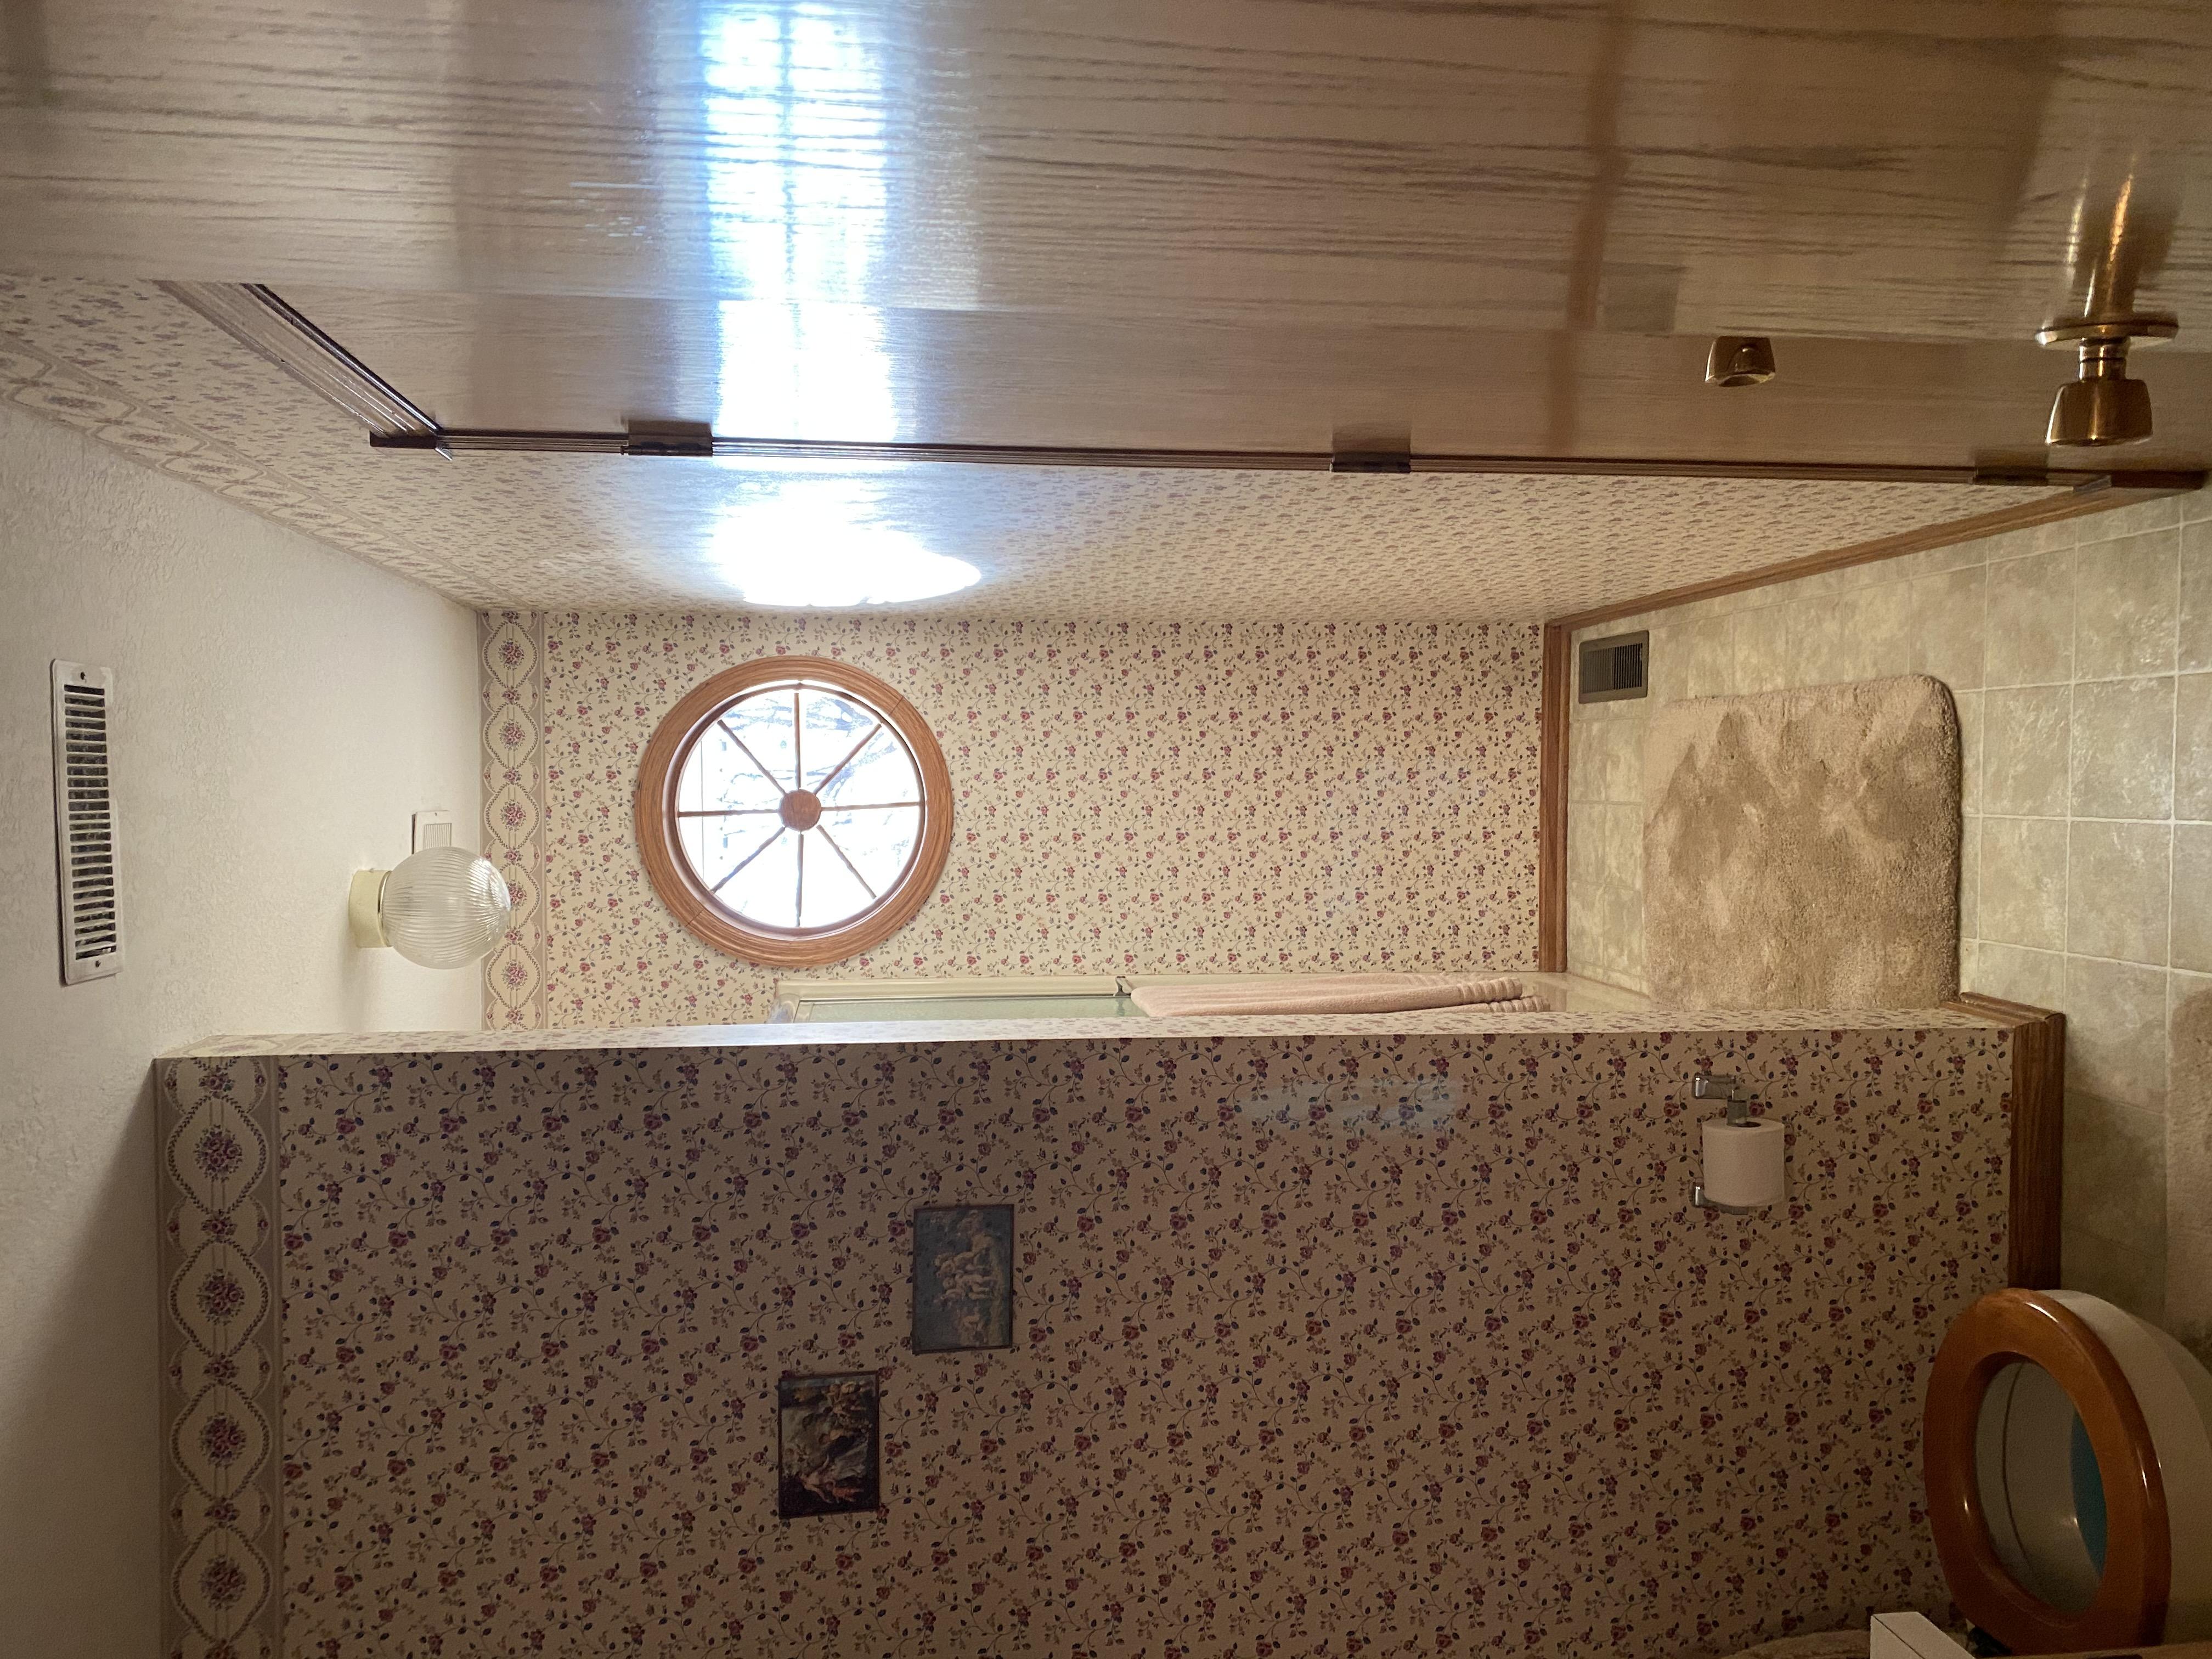 2058 HIllside Ave Mondamin bathroom4